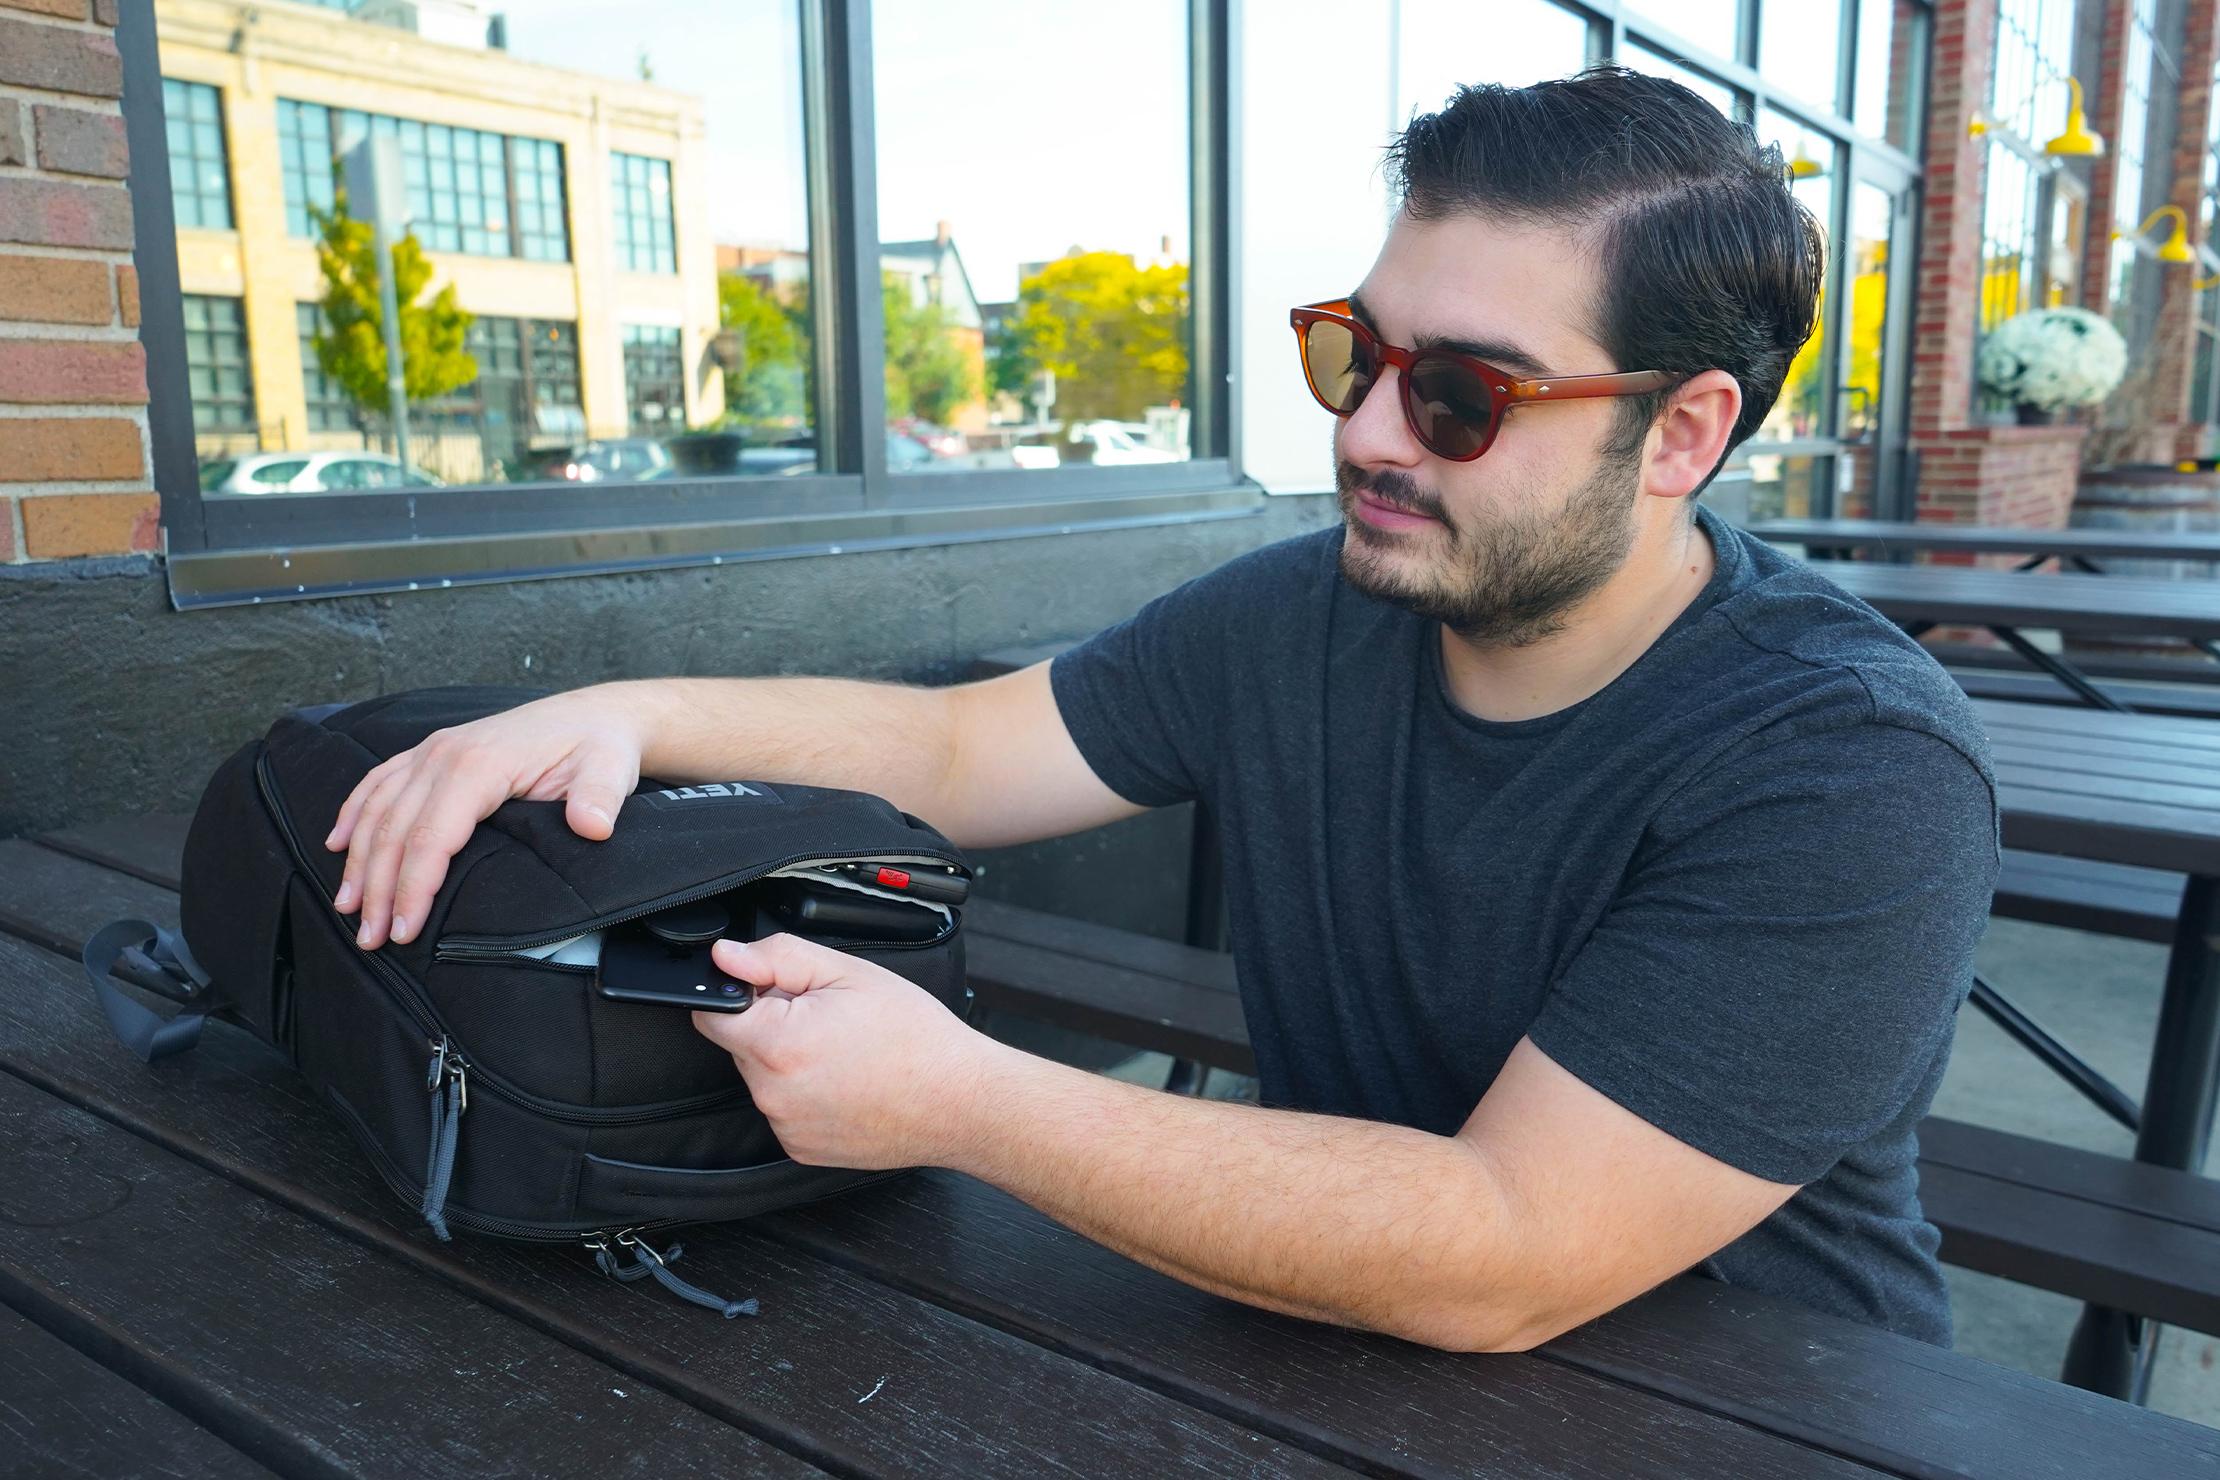 YETI Crossroads Backpack 23 Quick-Grab Pocket Access